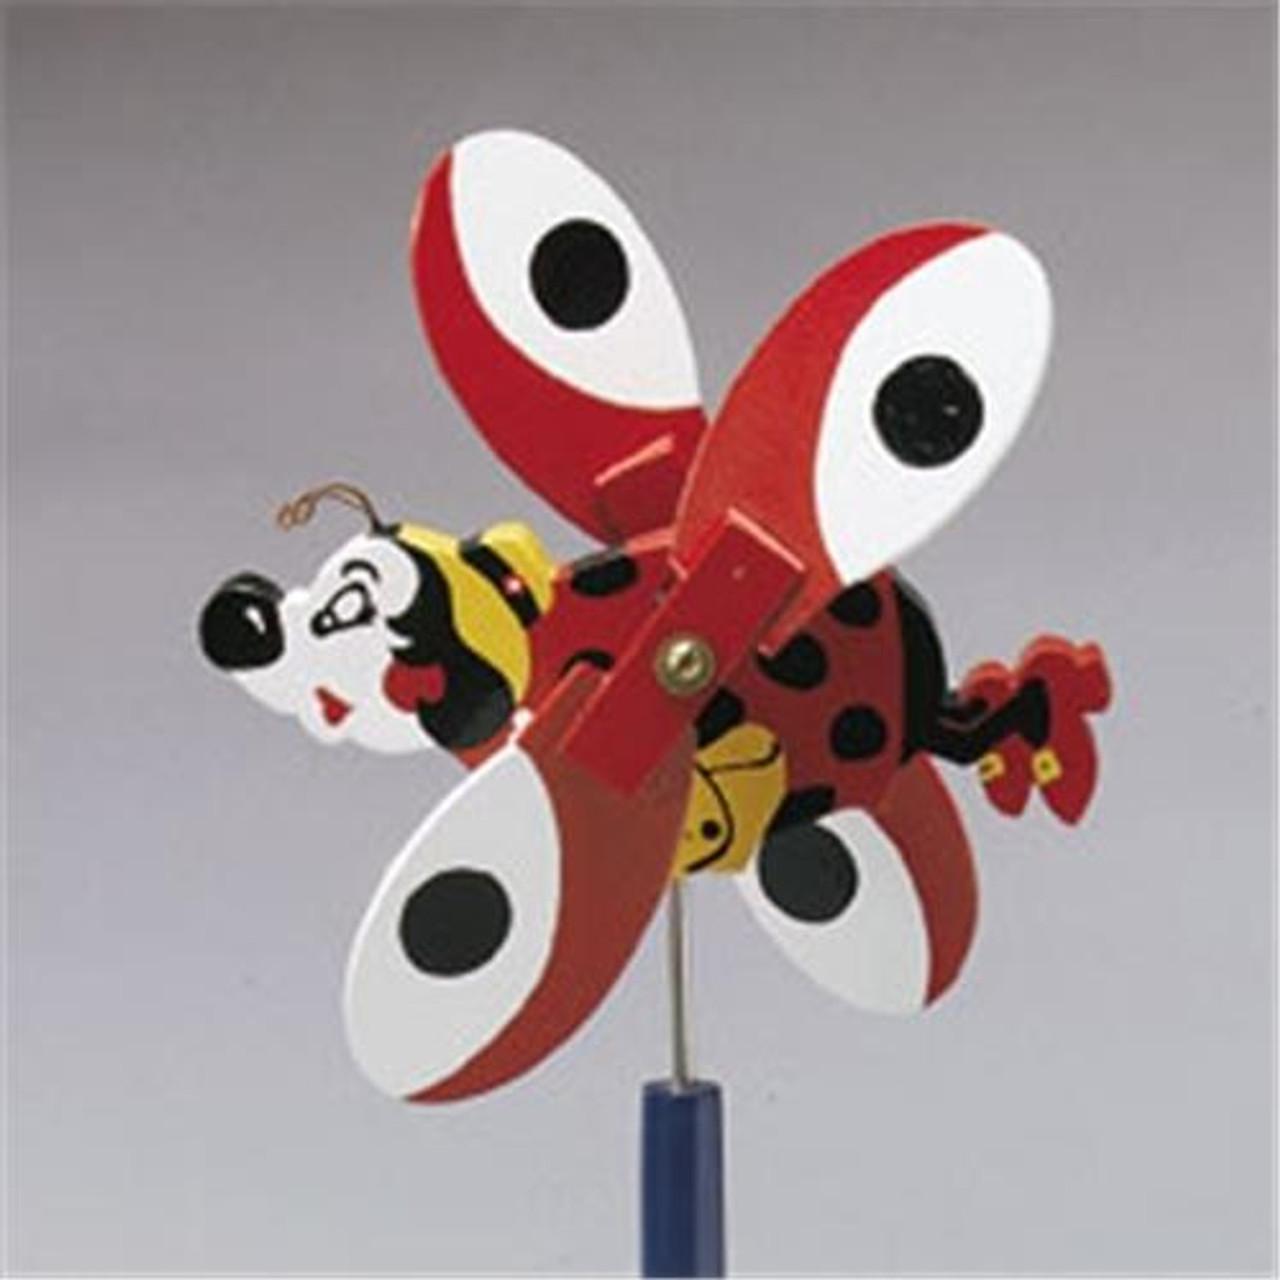 Cherry Tree Toys Lady Bug Whirligig DIY Kit